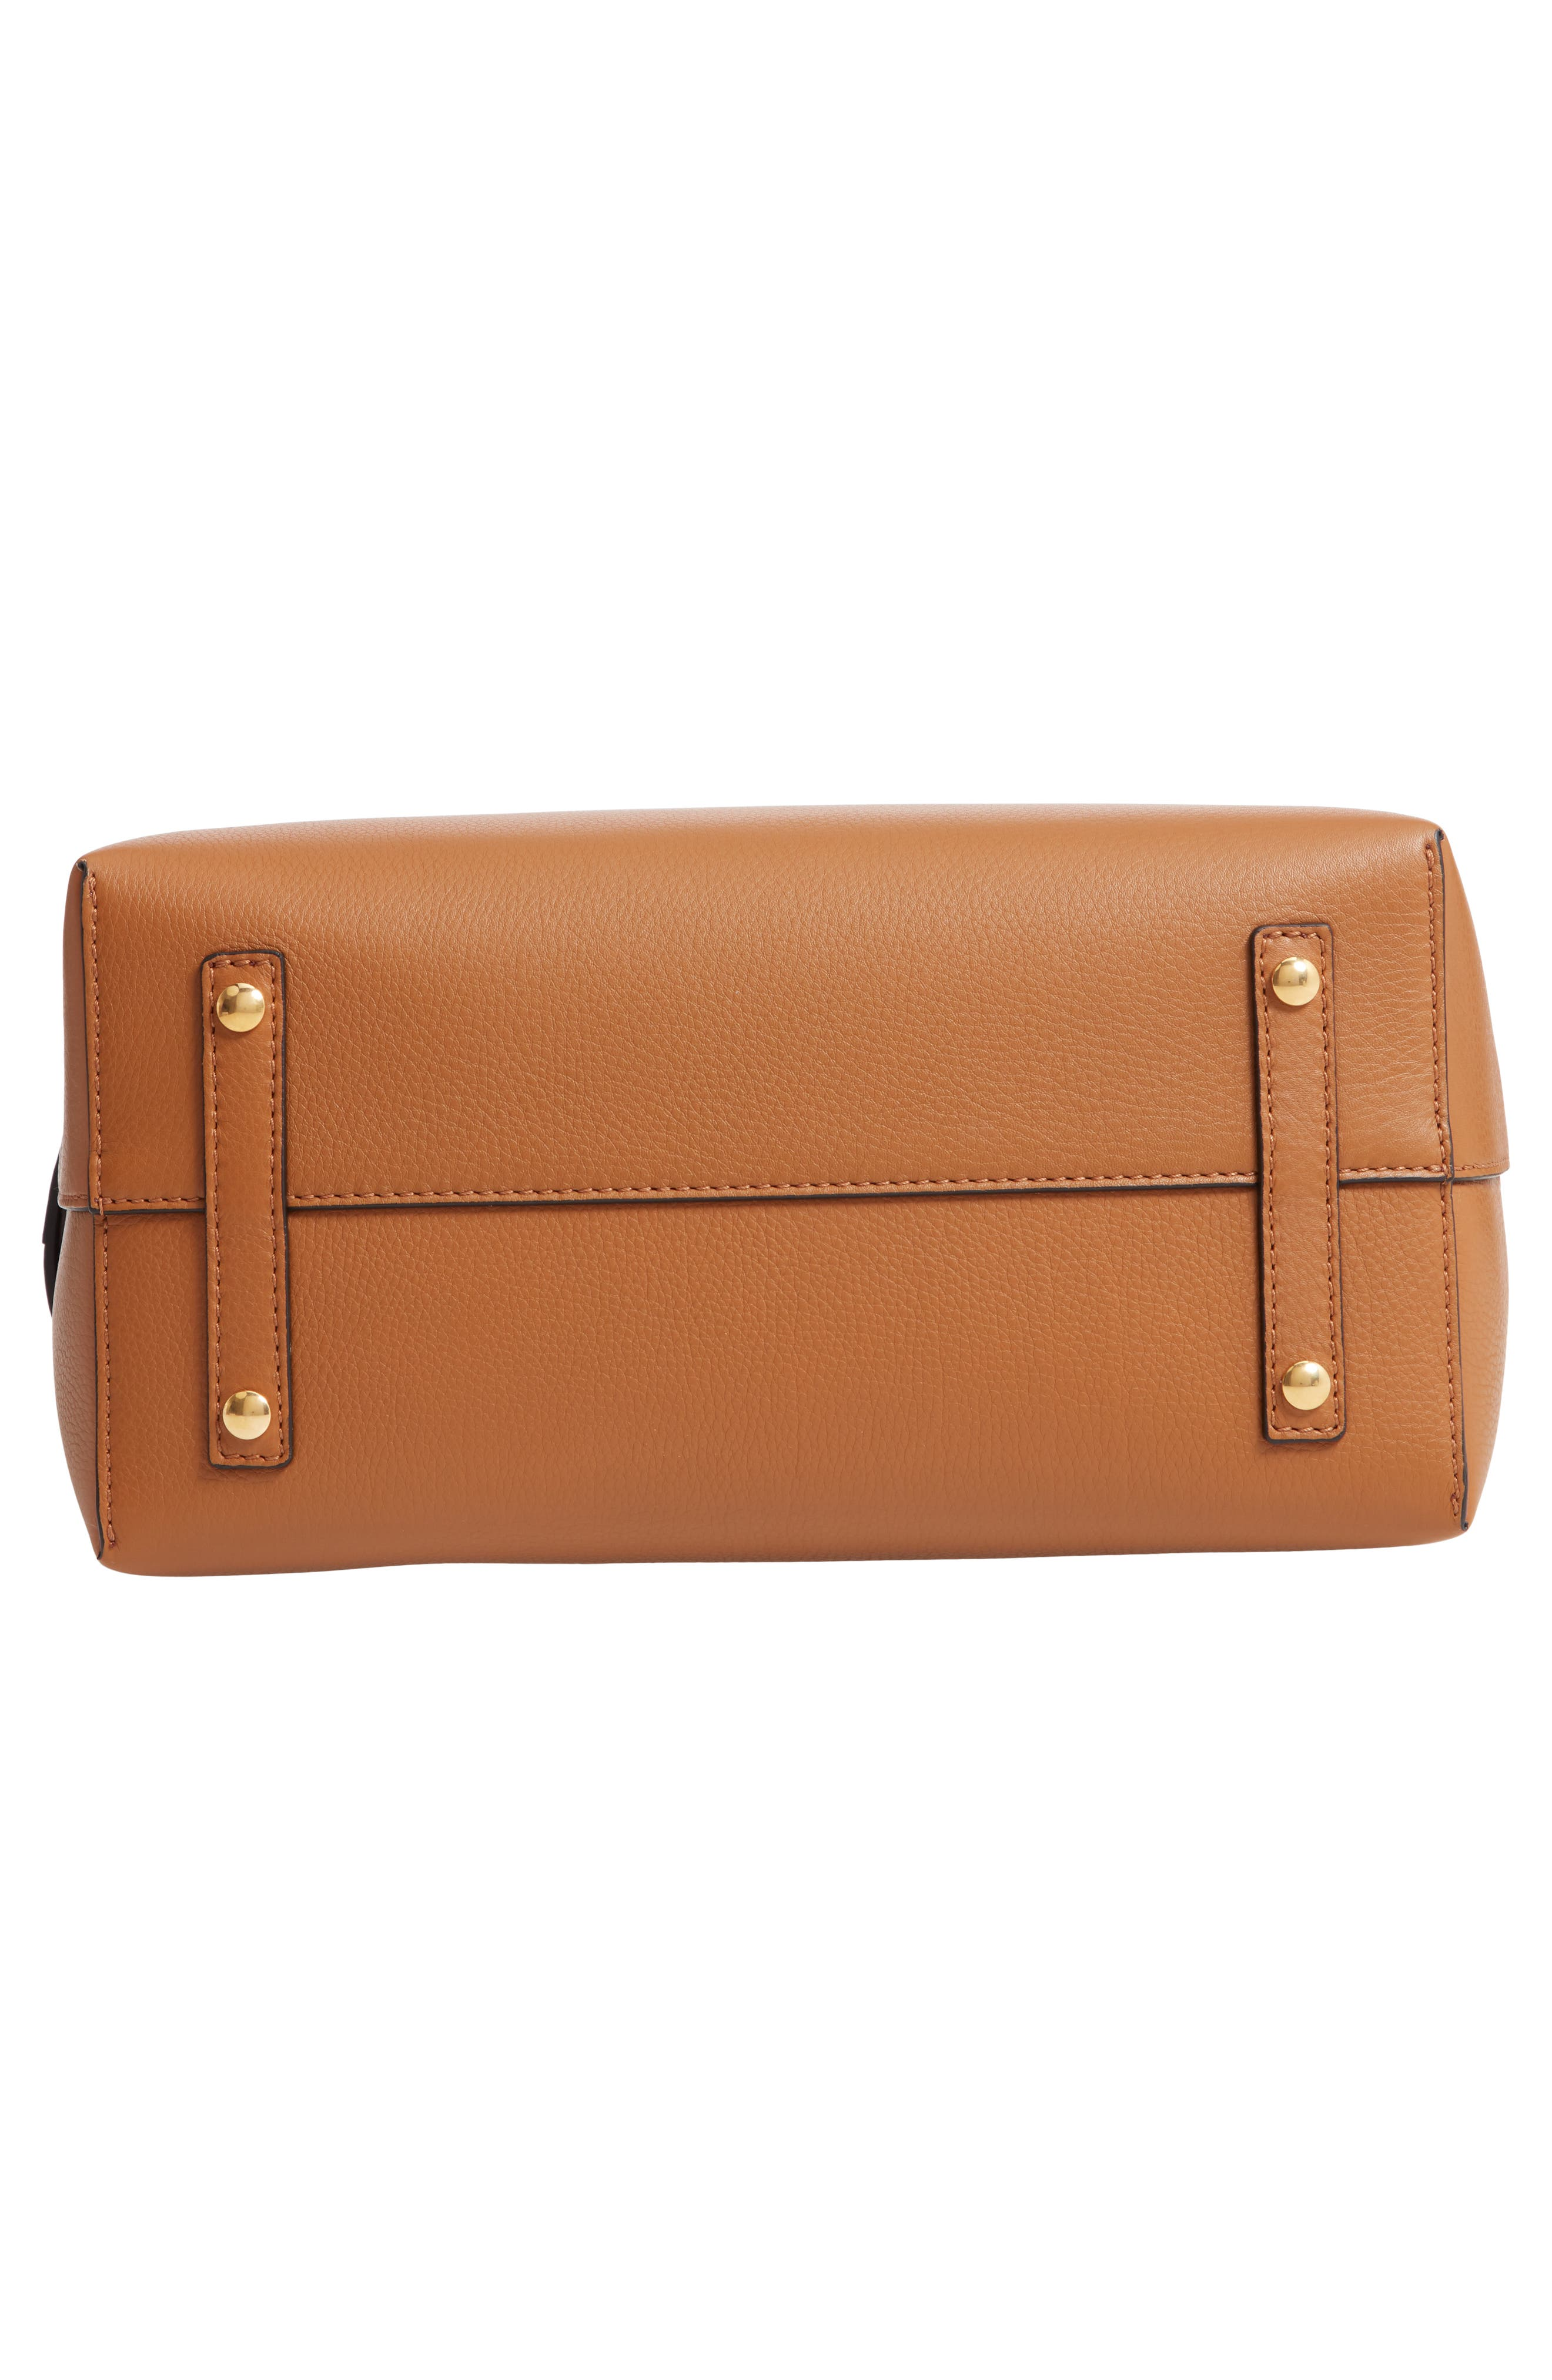 Medium Belt Bag Leather Tote,                             Alternate thumbnail 6, color,                             COGNAC